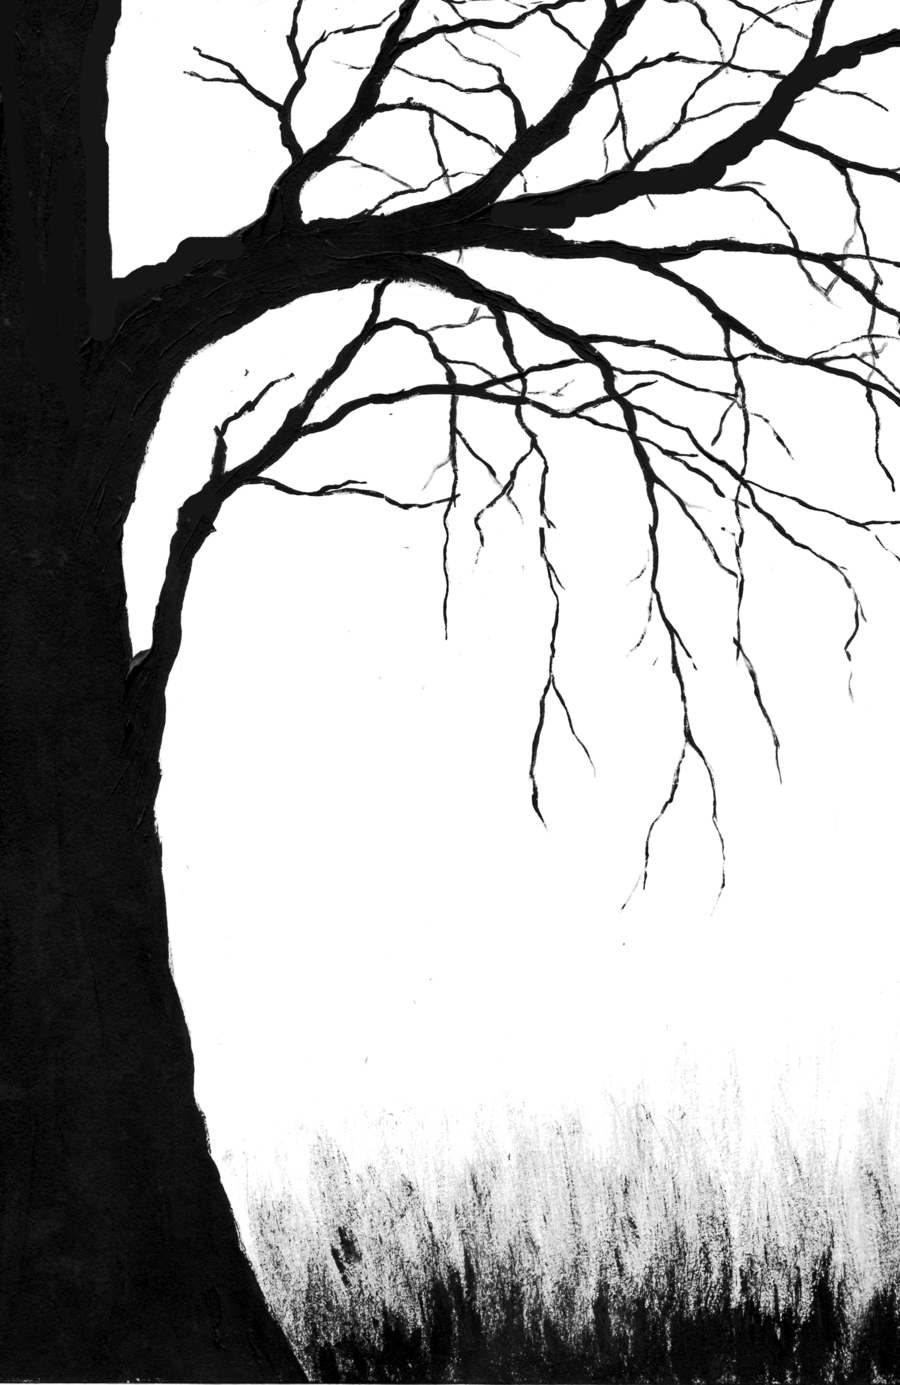 Creepy Tree. Tree trunk drawing, Tree outline, Spooky trees